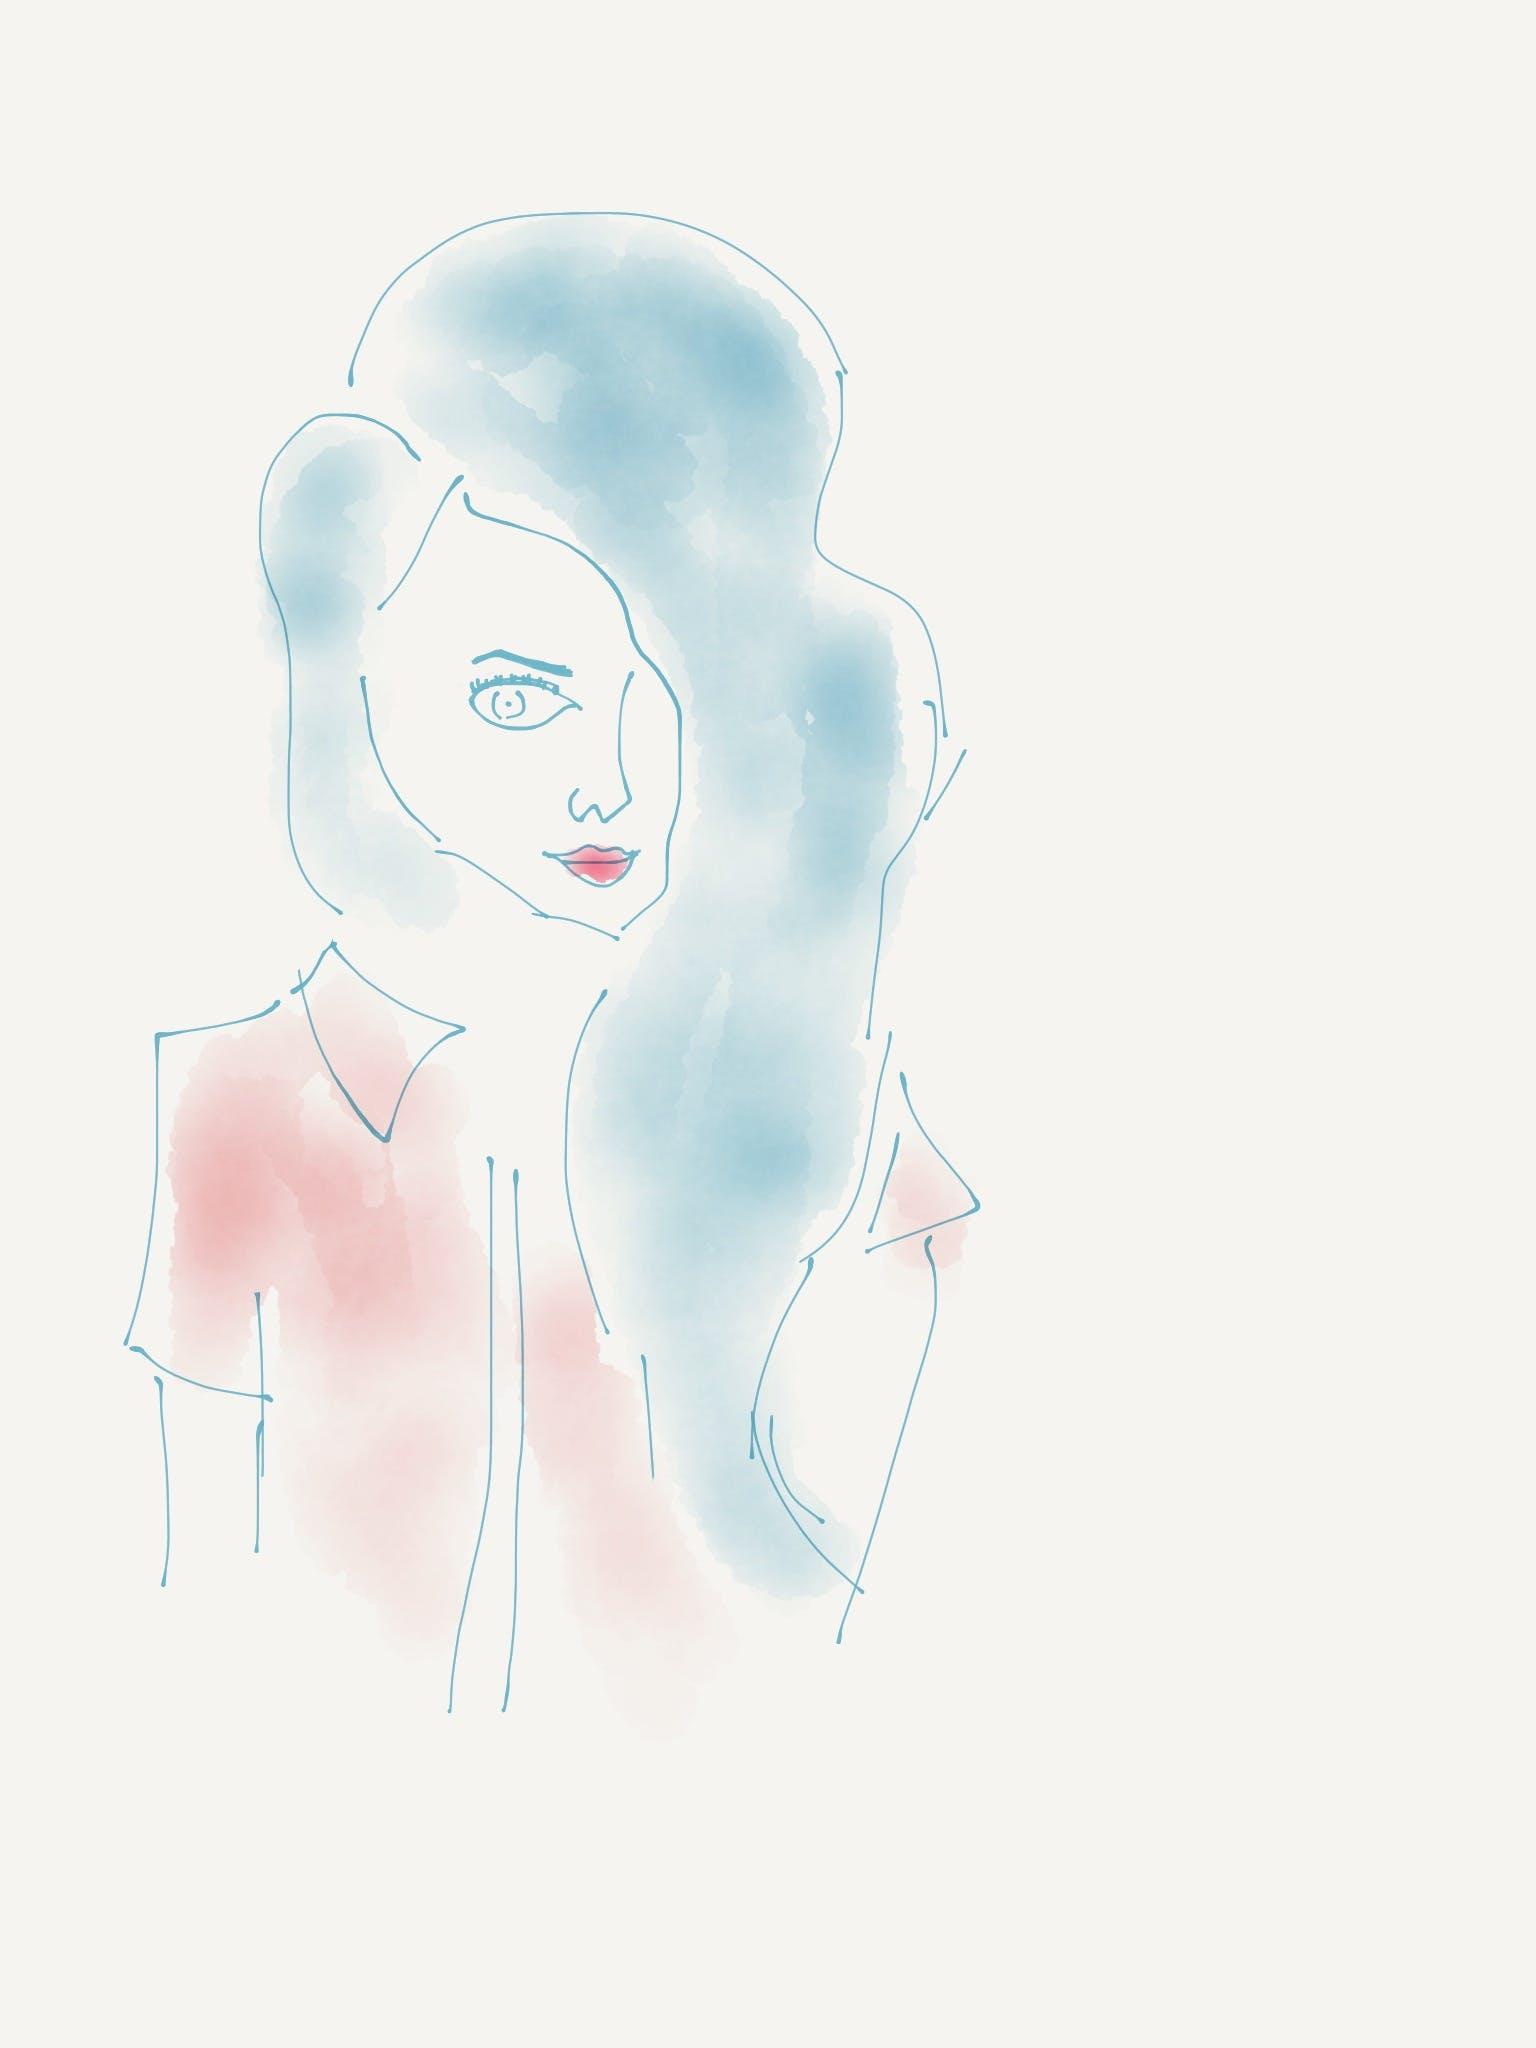 Free stock photo of art, digital art, girl, sketching